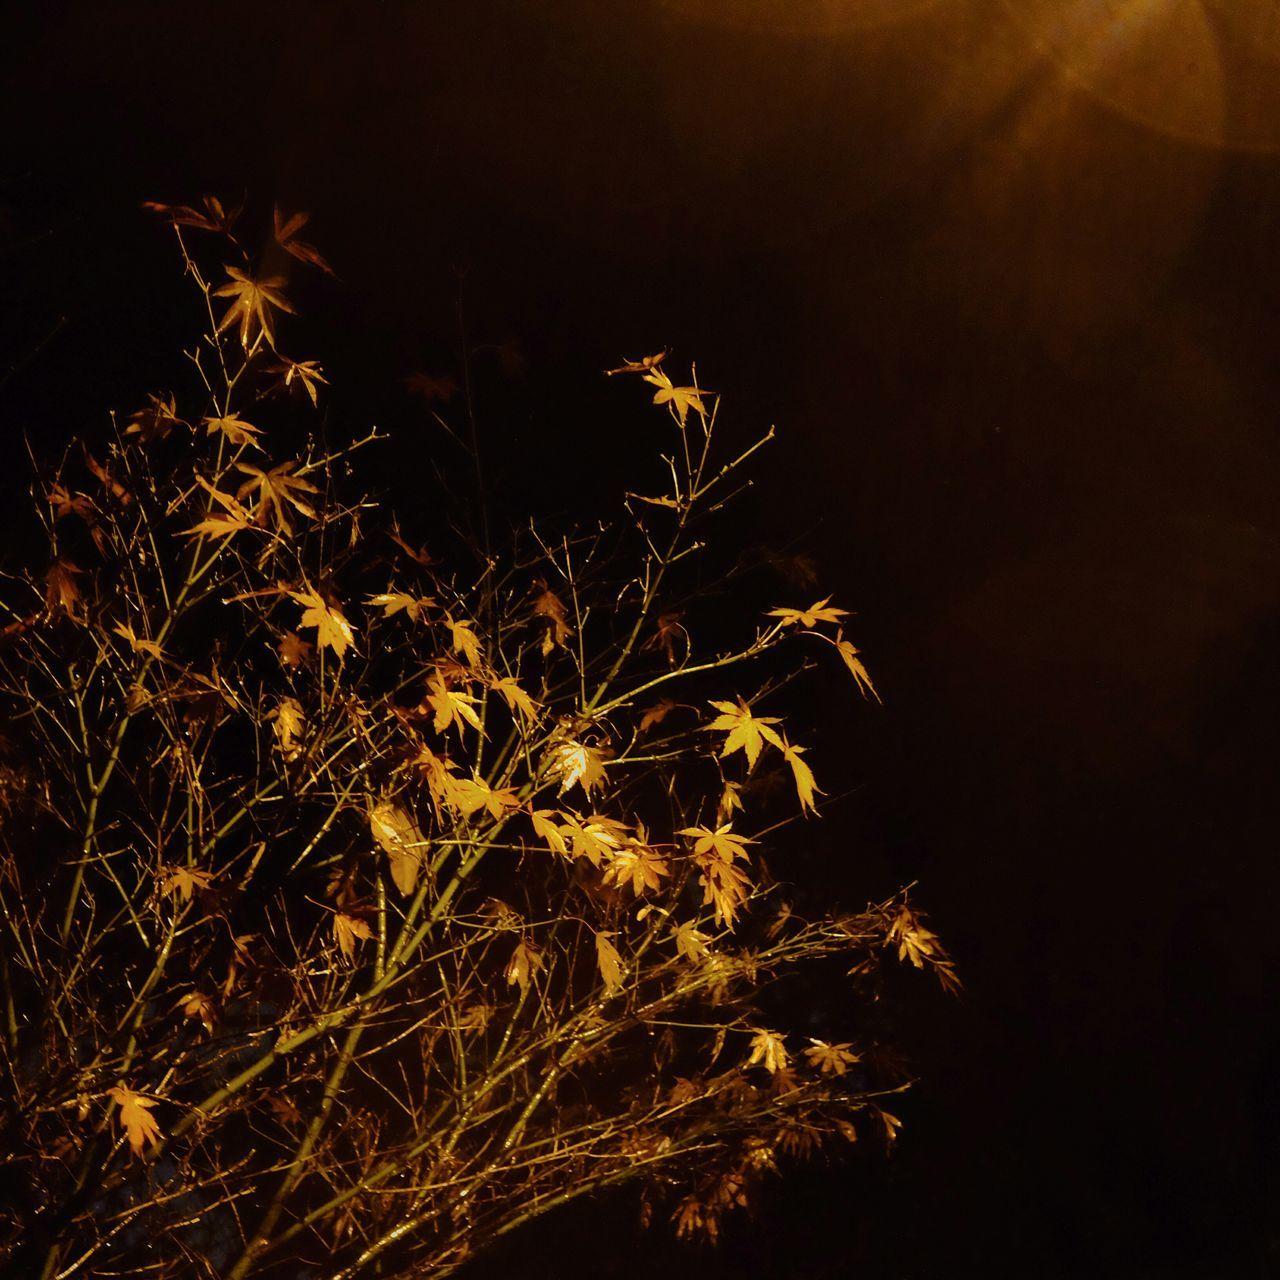 Hanging Out Leaves Night View Night Enjoying Life 富士 Fujifilm China Colors Hello World Eye4photography  EyeEm Best Shots - Nature Trees Taking Photos EyeEm Best Shots Rian Nightphotography